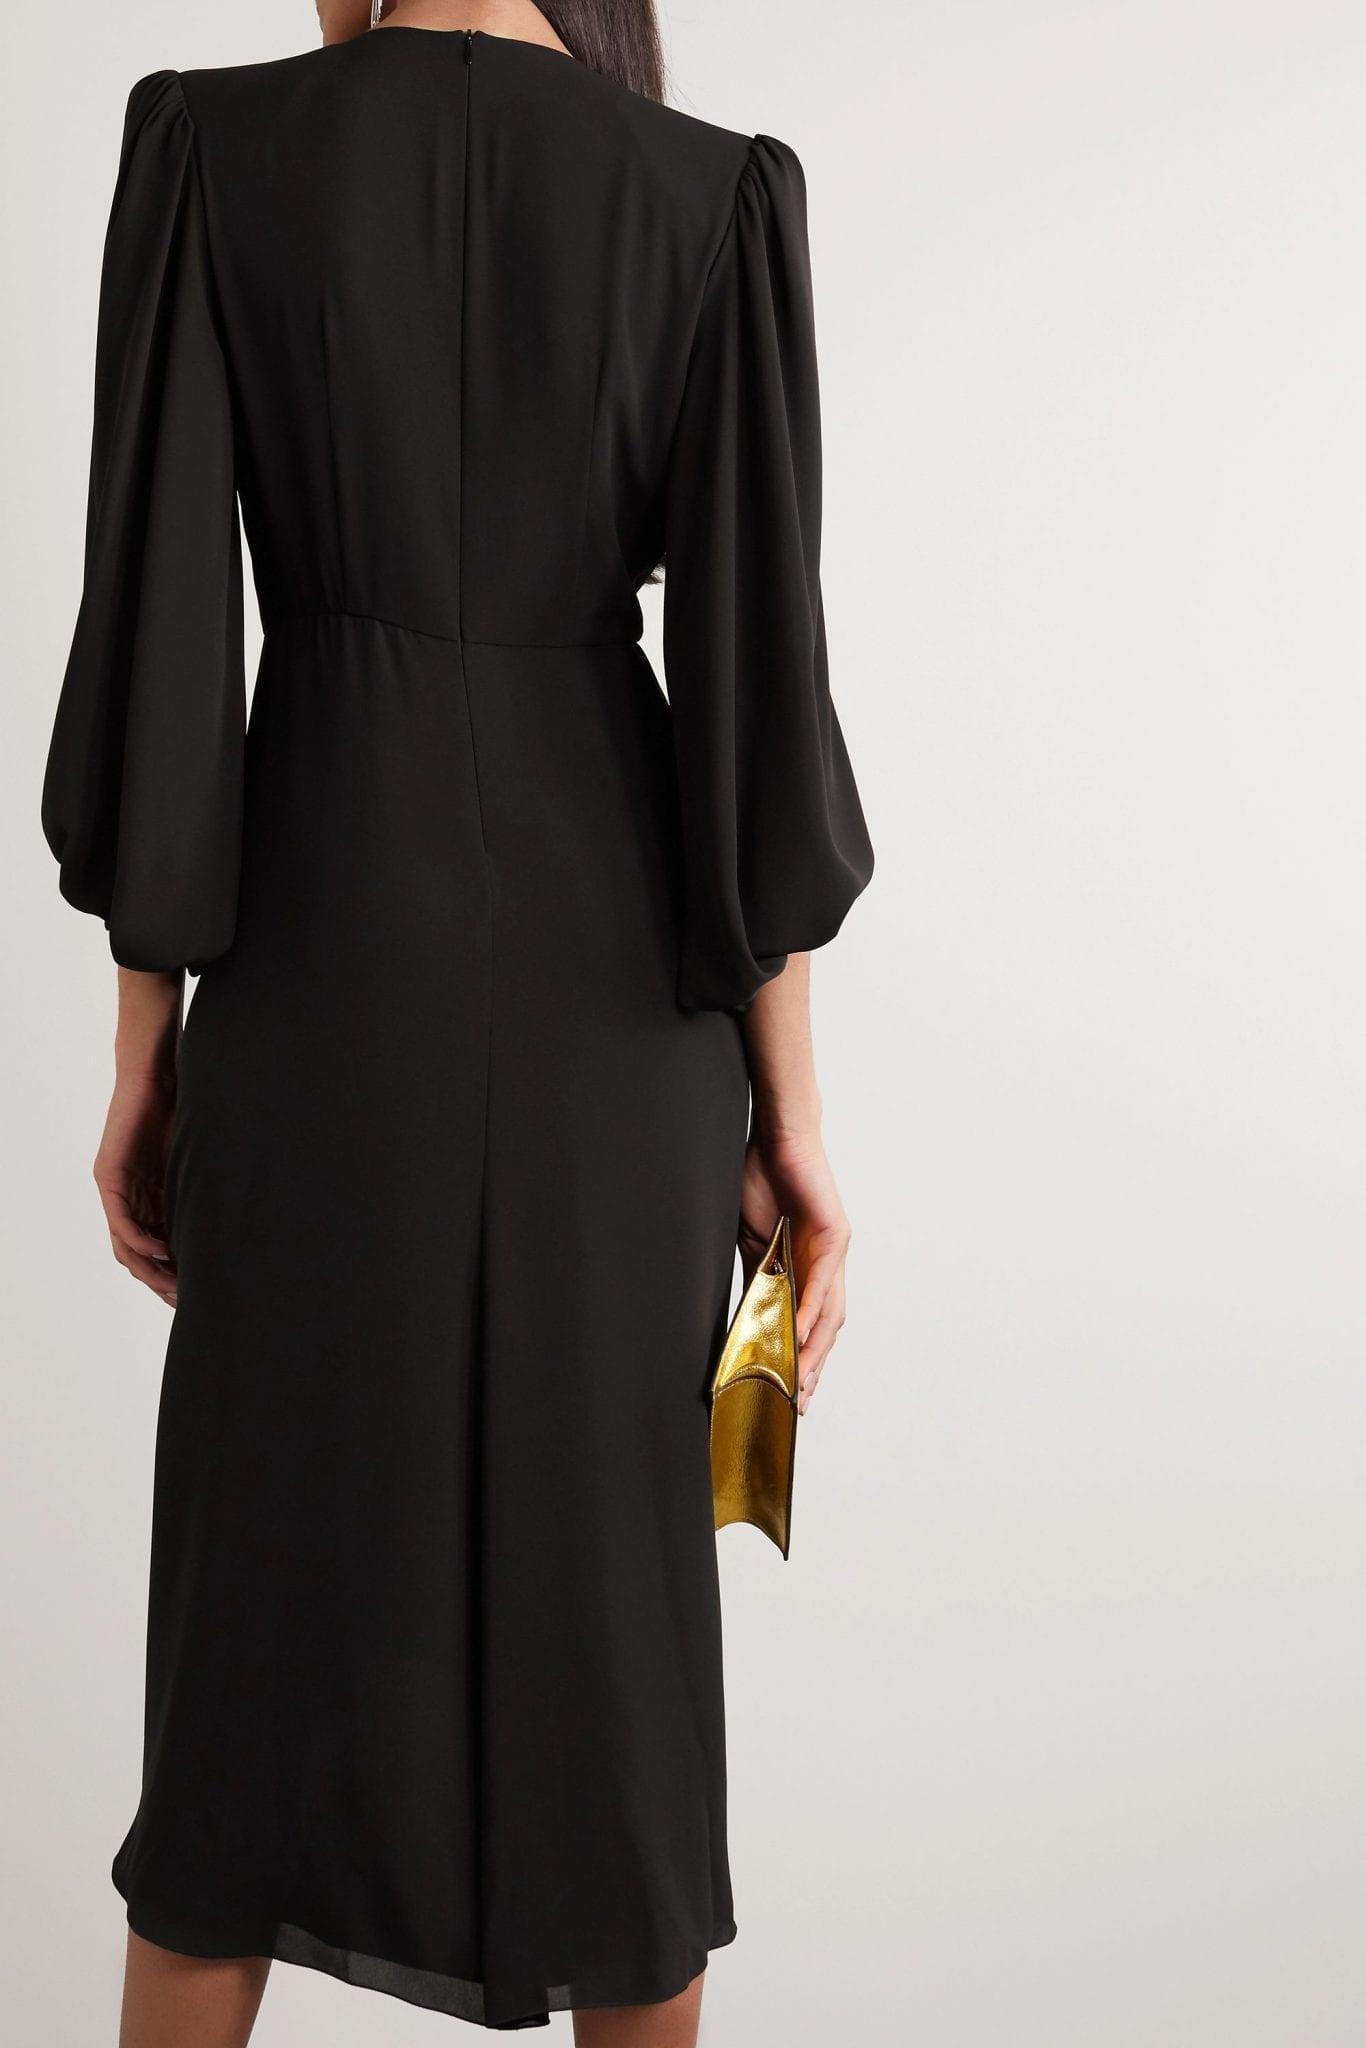 PHILOSOPHY DI LORENZO SERAFINI Asymmetric Gathered Crepe Dress